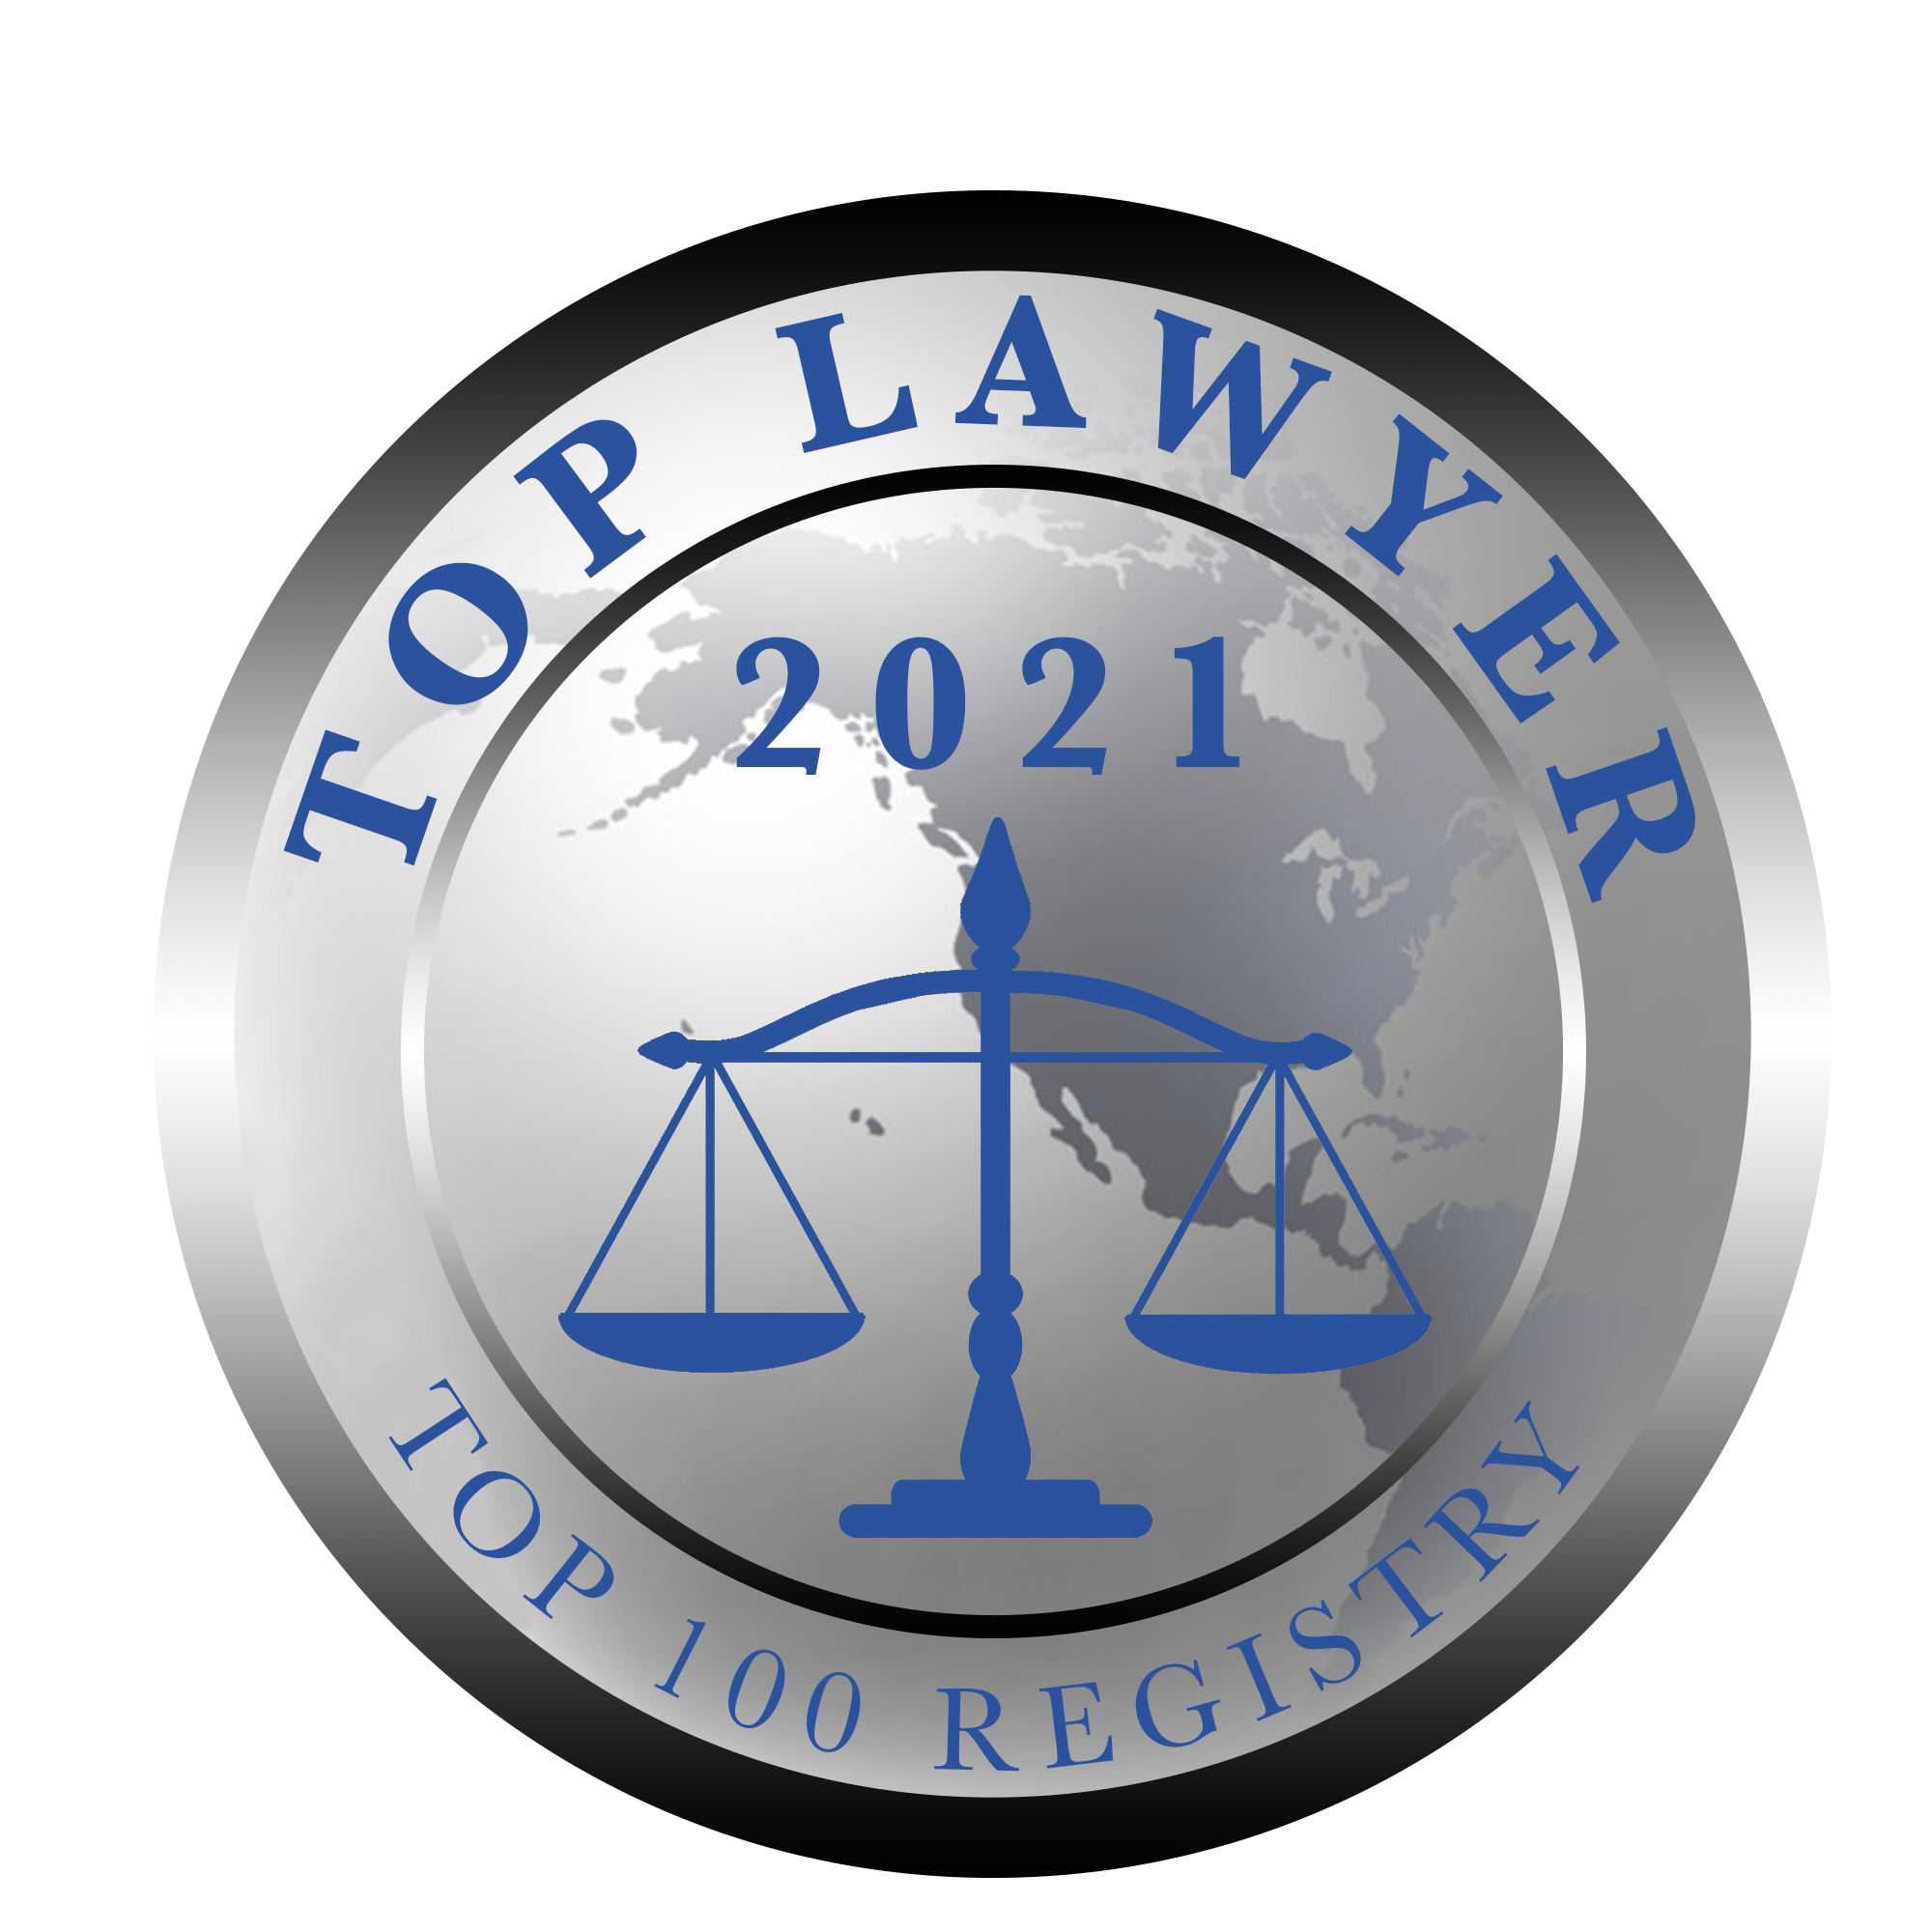 Top 100 Lawyer - 2021 Badge